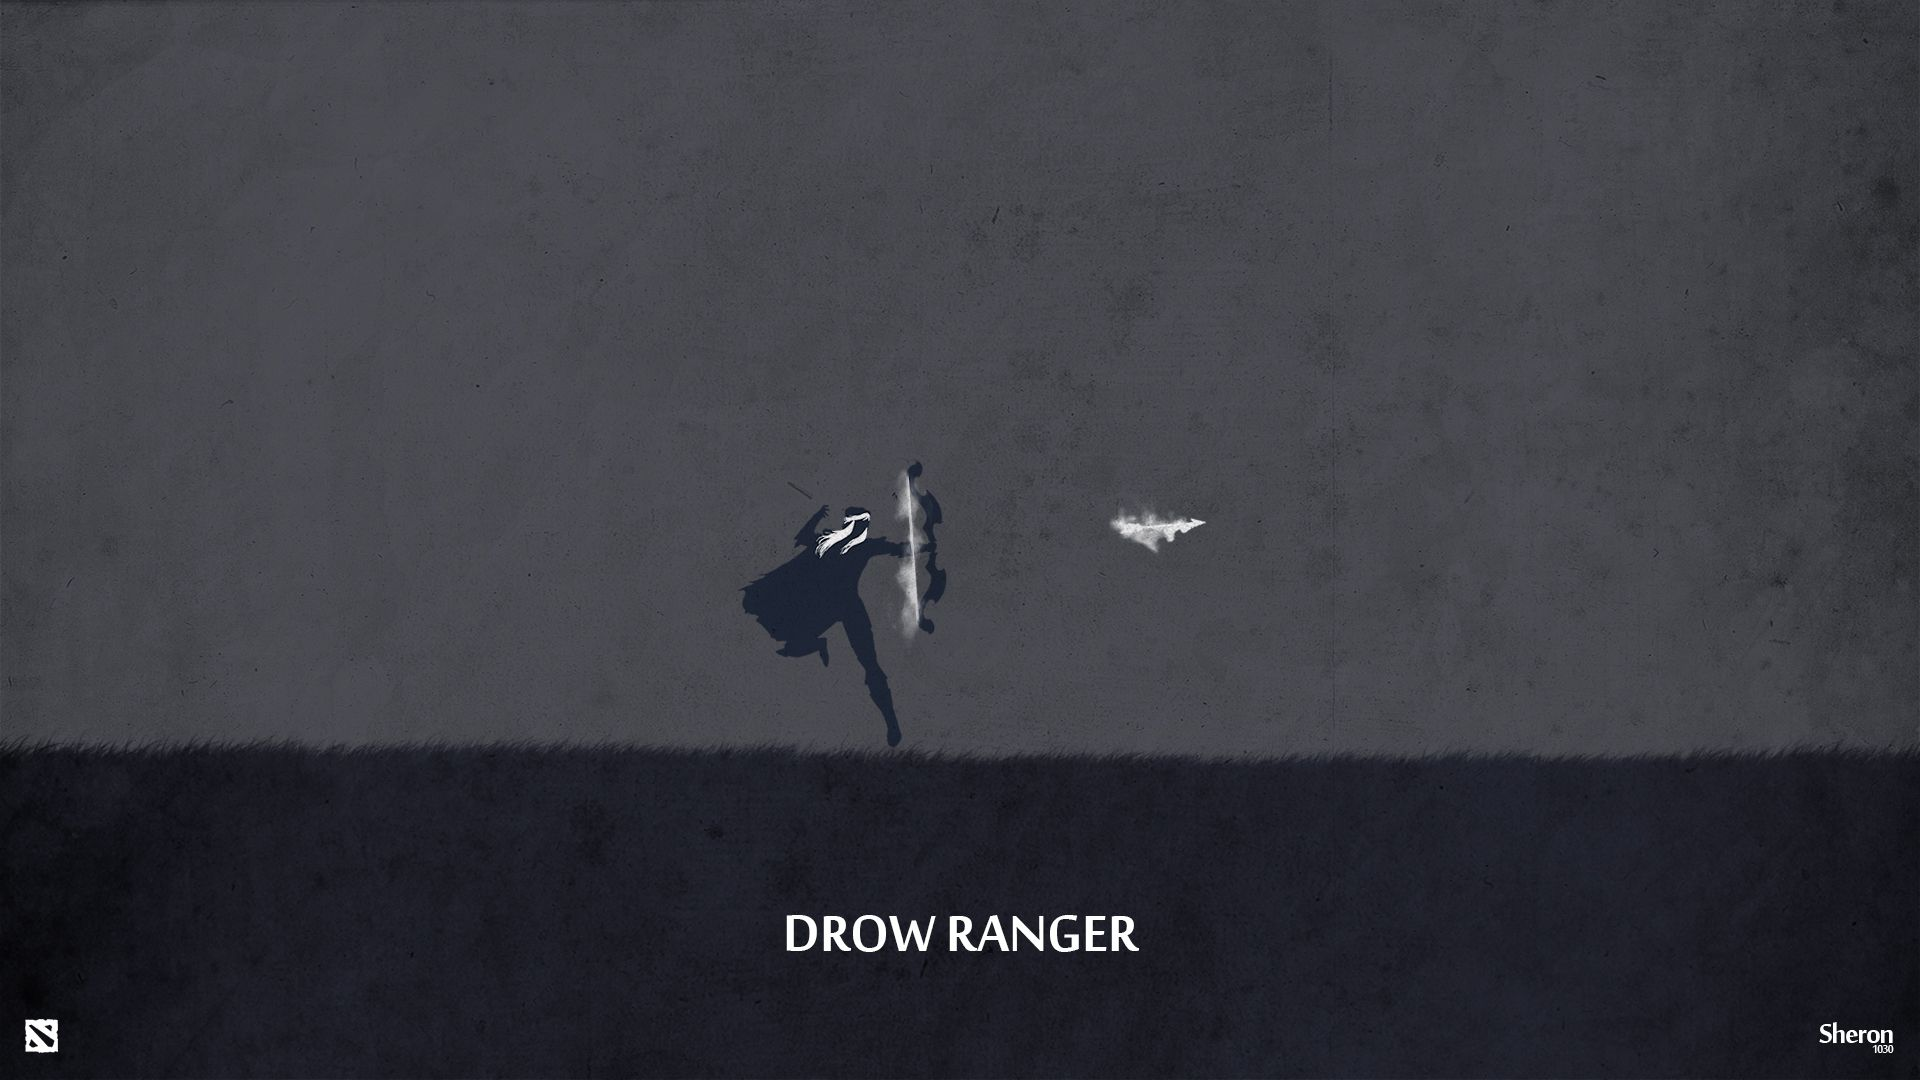 Google themes dota 2 - Dota 2 Drow Ranger Wallpaper By Sheron1030 Deviantart Com On Deviantart